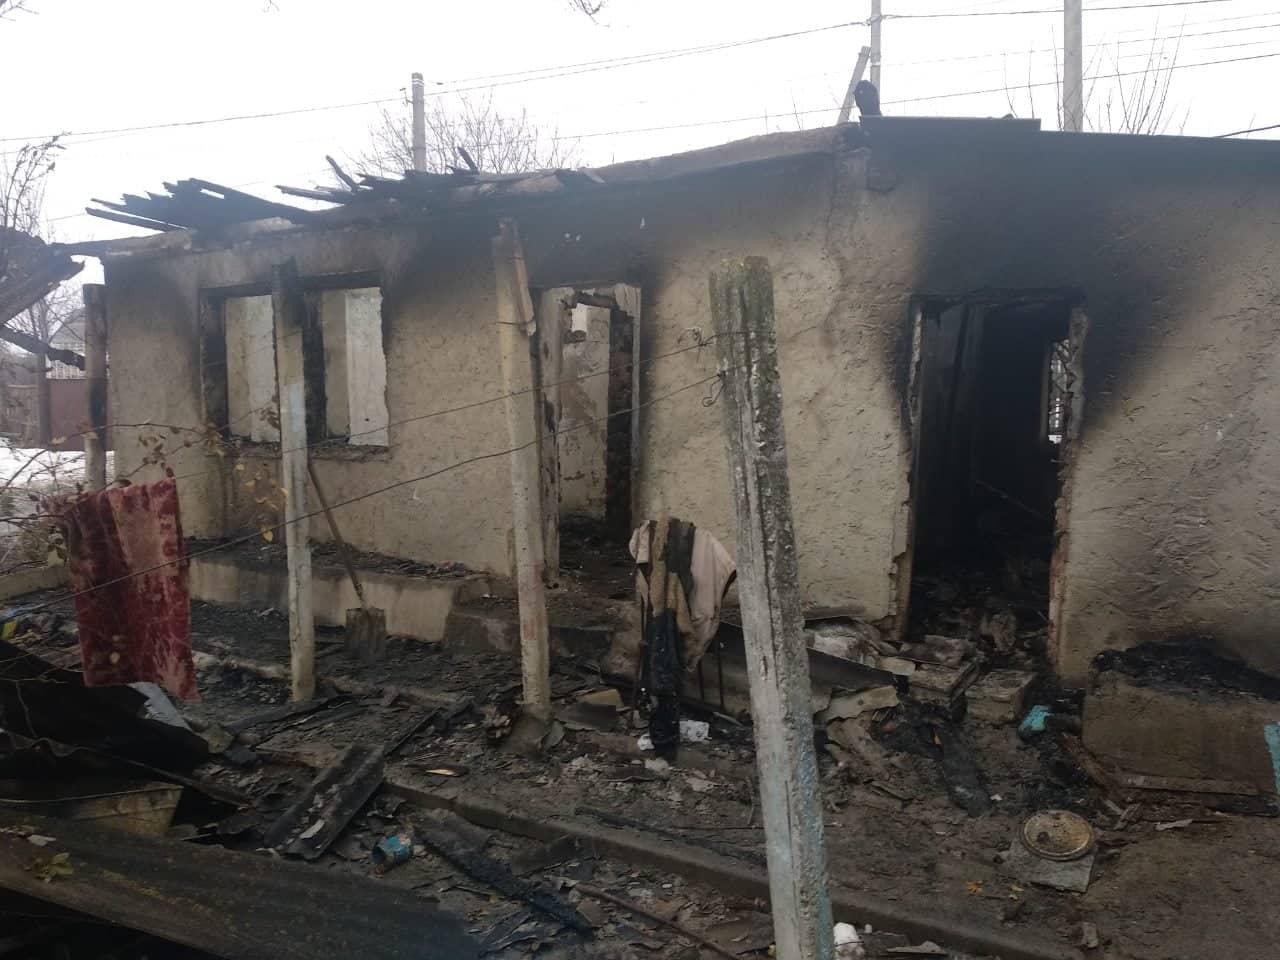 incendiu leova, igsu, inspectoratul situatii de urgenta, departamentul situatii exceptionale